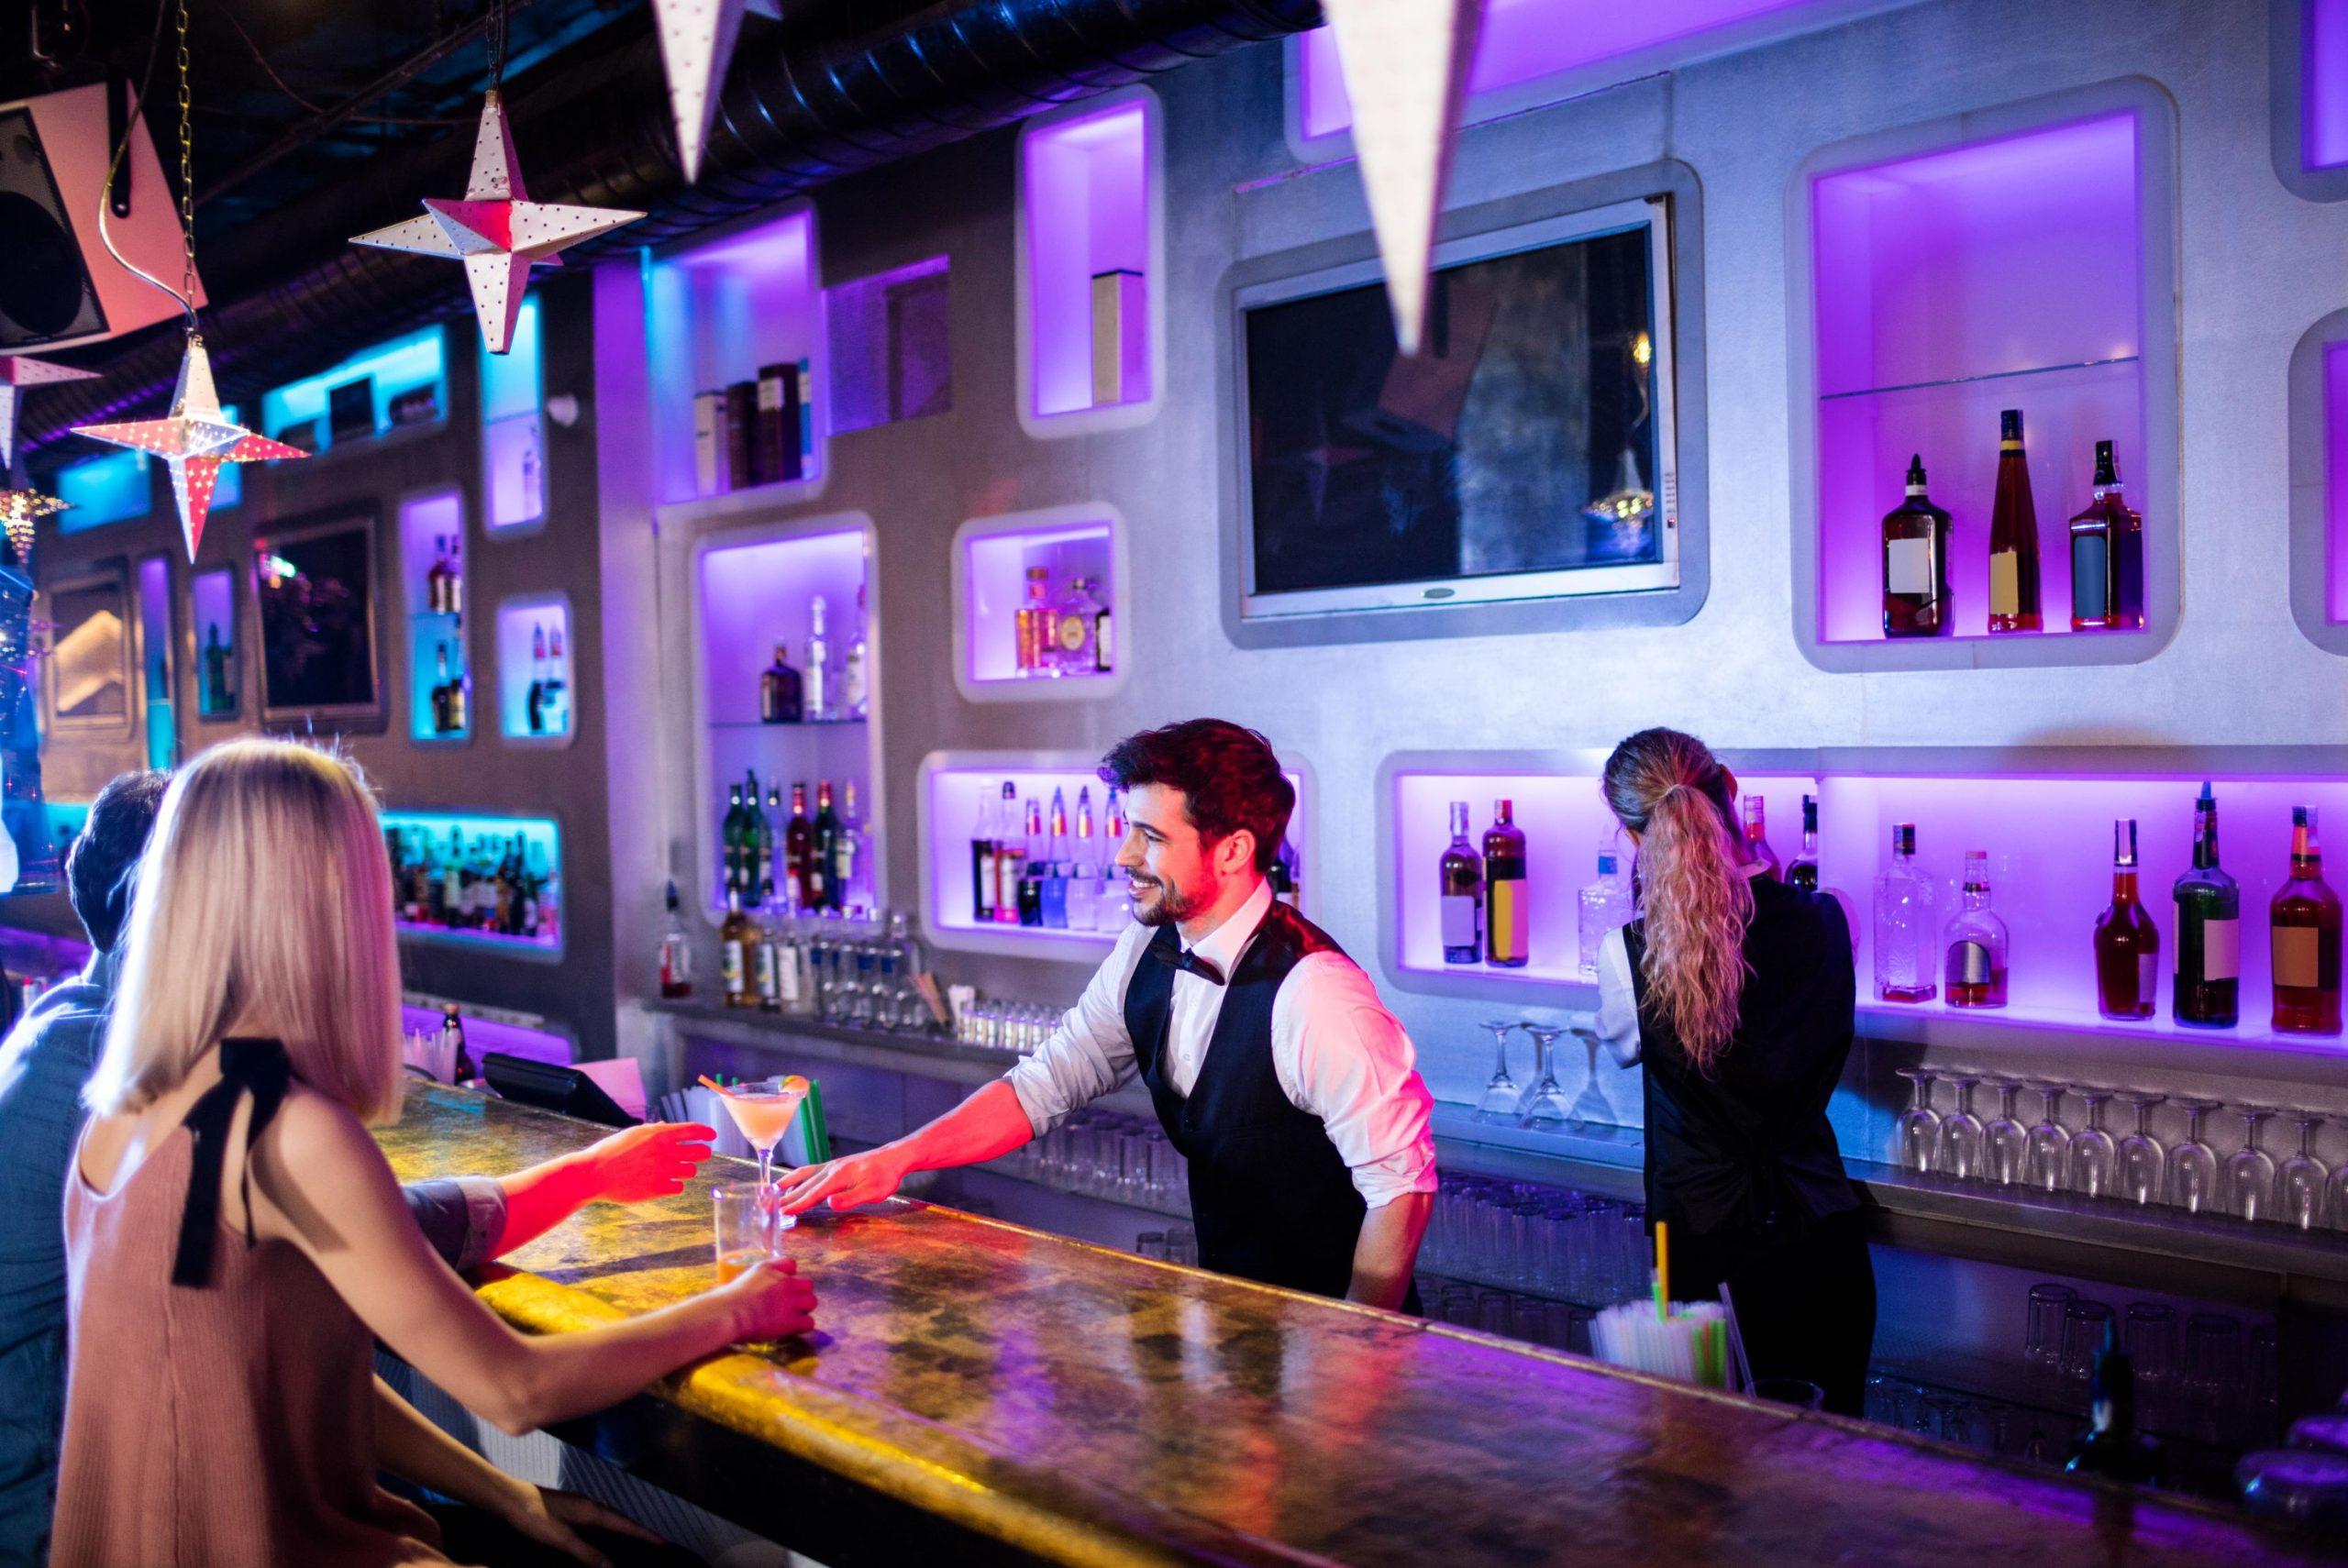 waiter-serving-cocktail-KQKMU4Z